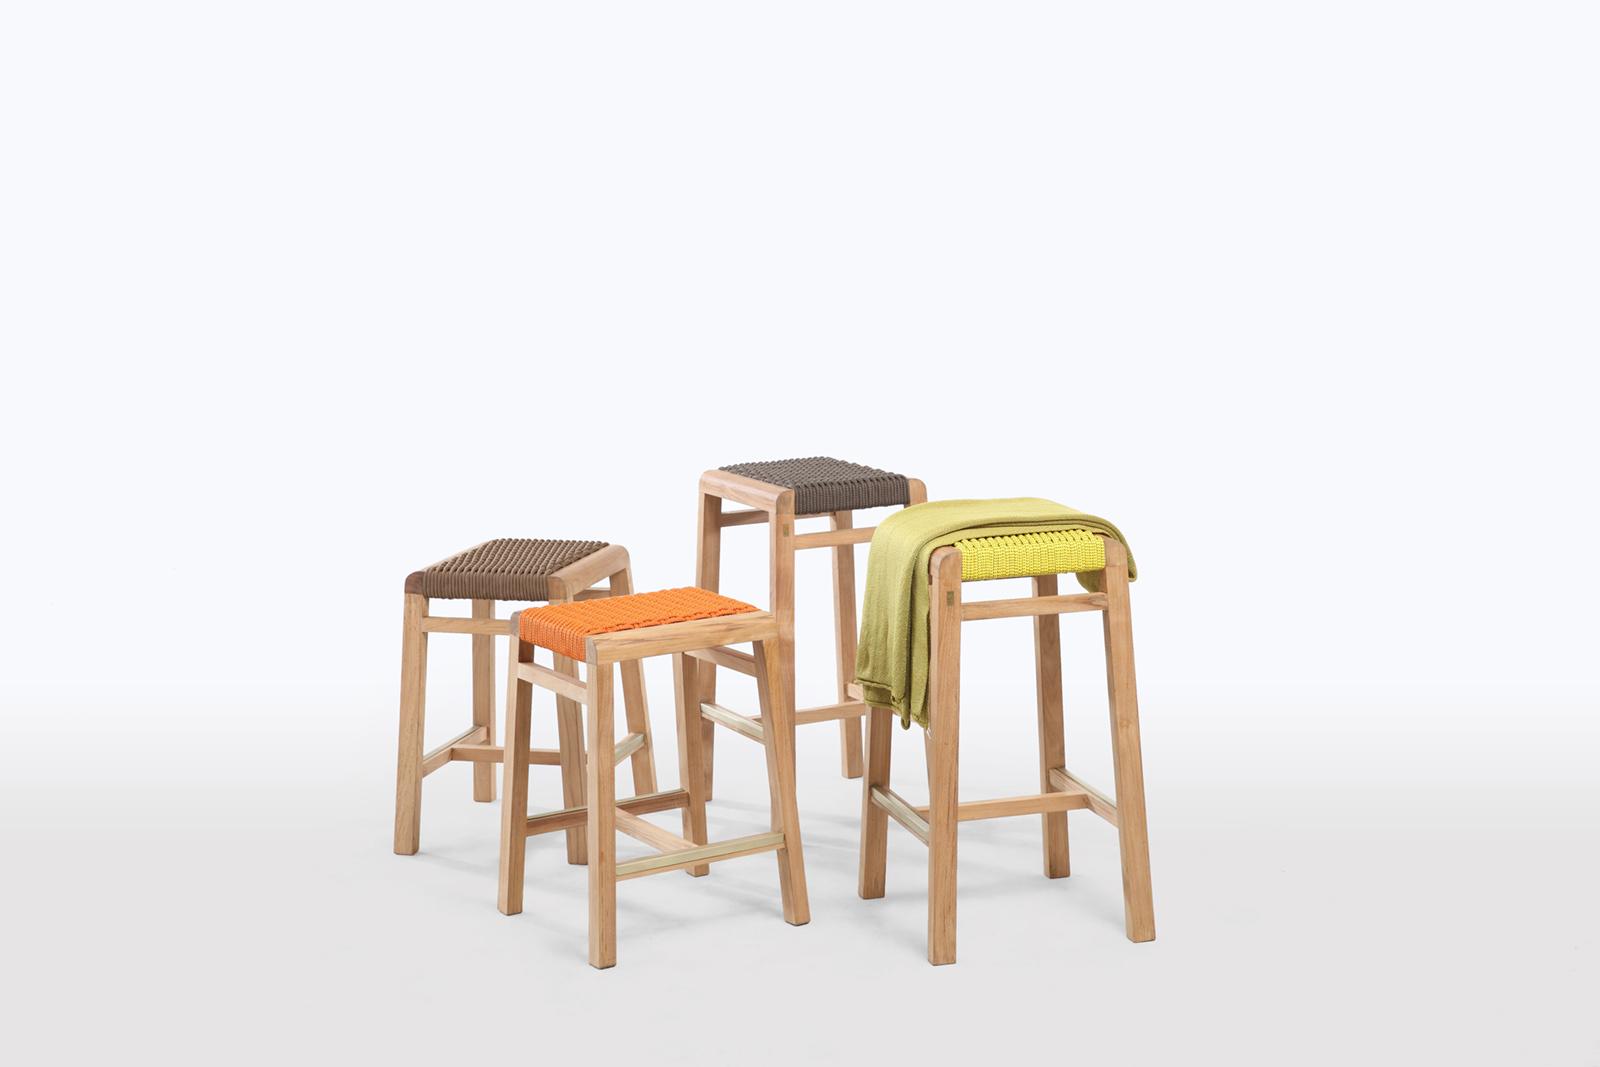 4L Teak Rope Stools – Lebello Outdoor Furniture